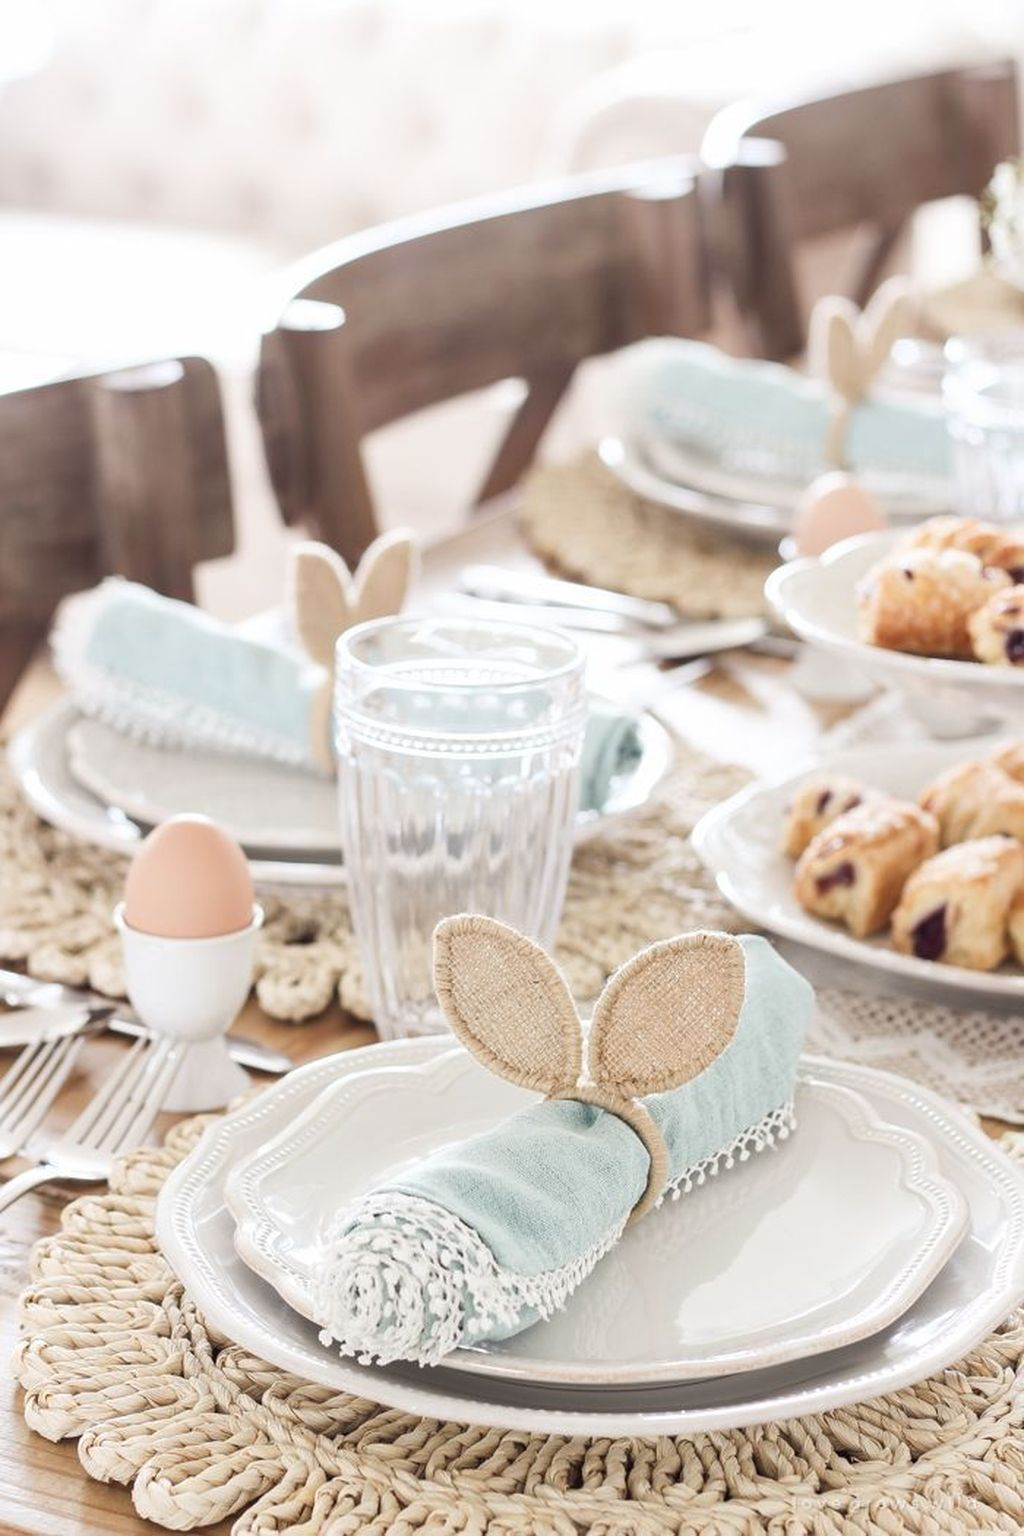 The Best Farmhouse Style Spring Tablescape Decor Ideas 06